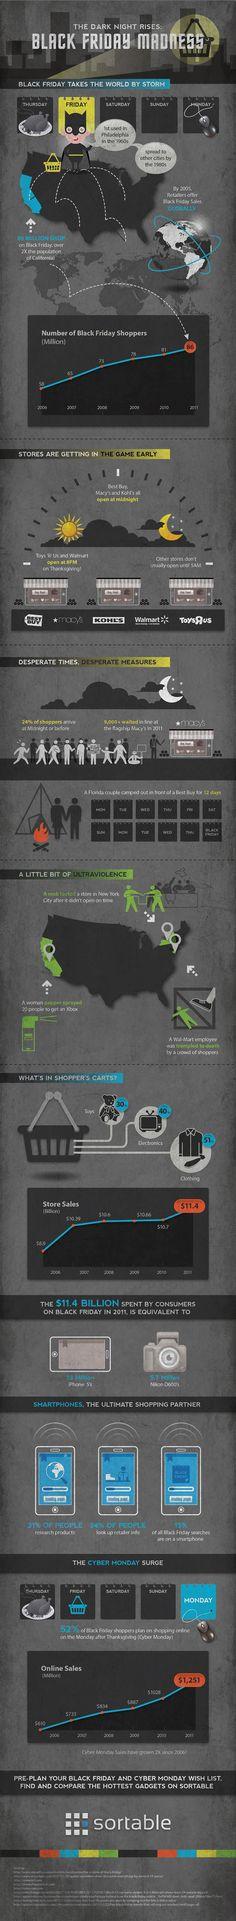 #INFOGRAPHIC: THE DARK NIGHT RISES – BLACK FRIDAY MADNESS